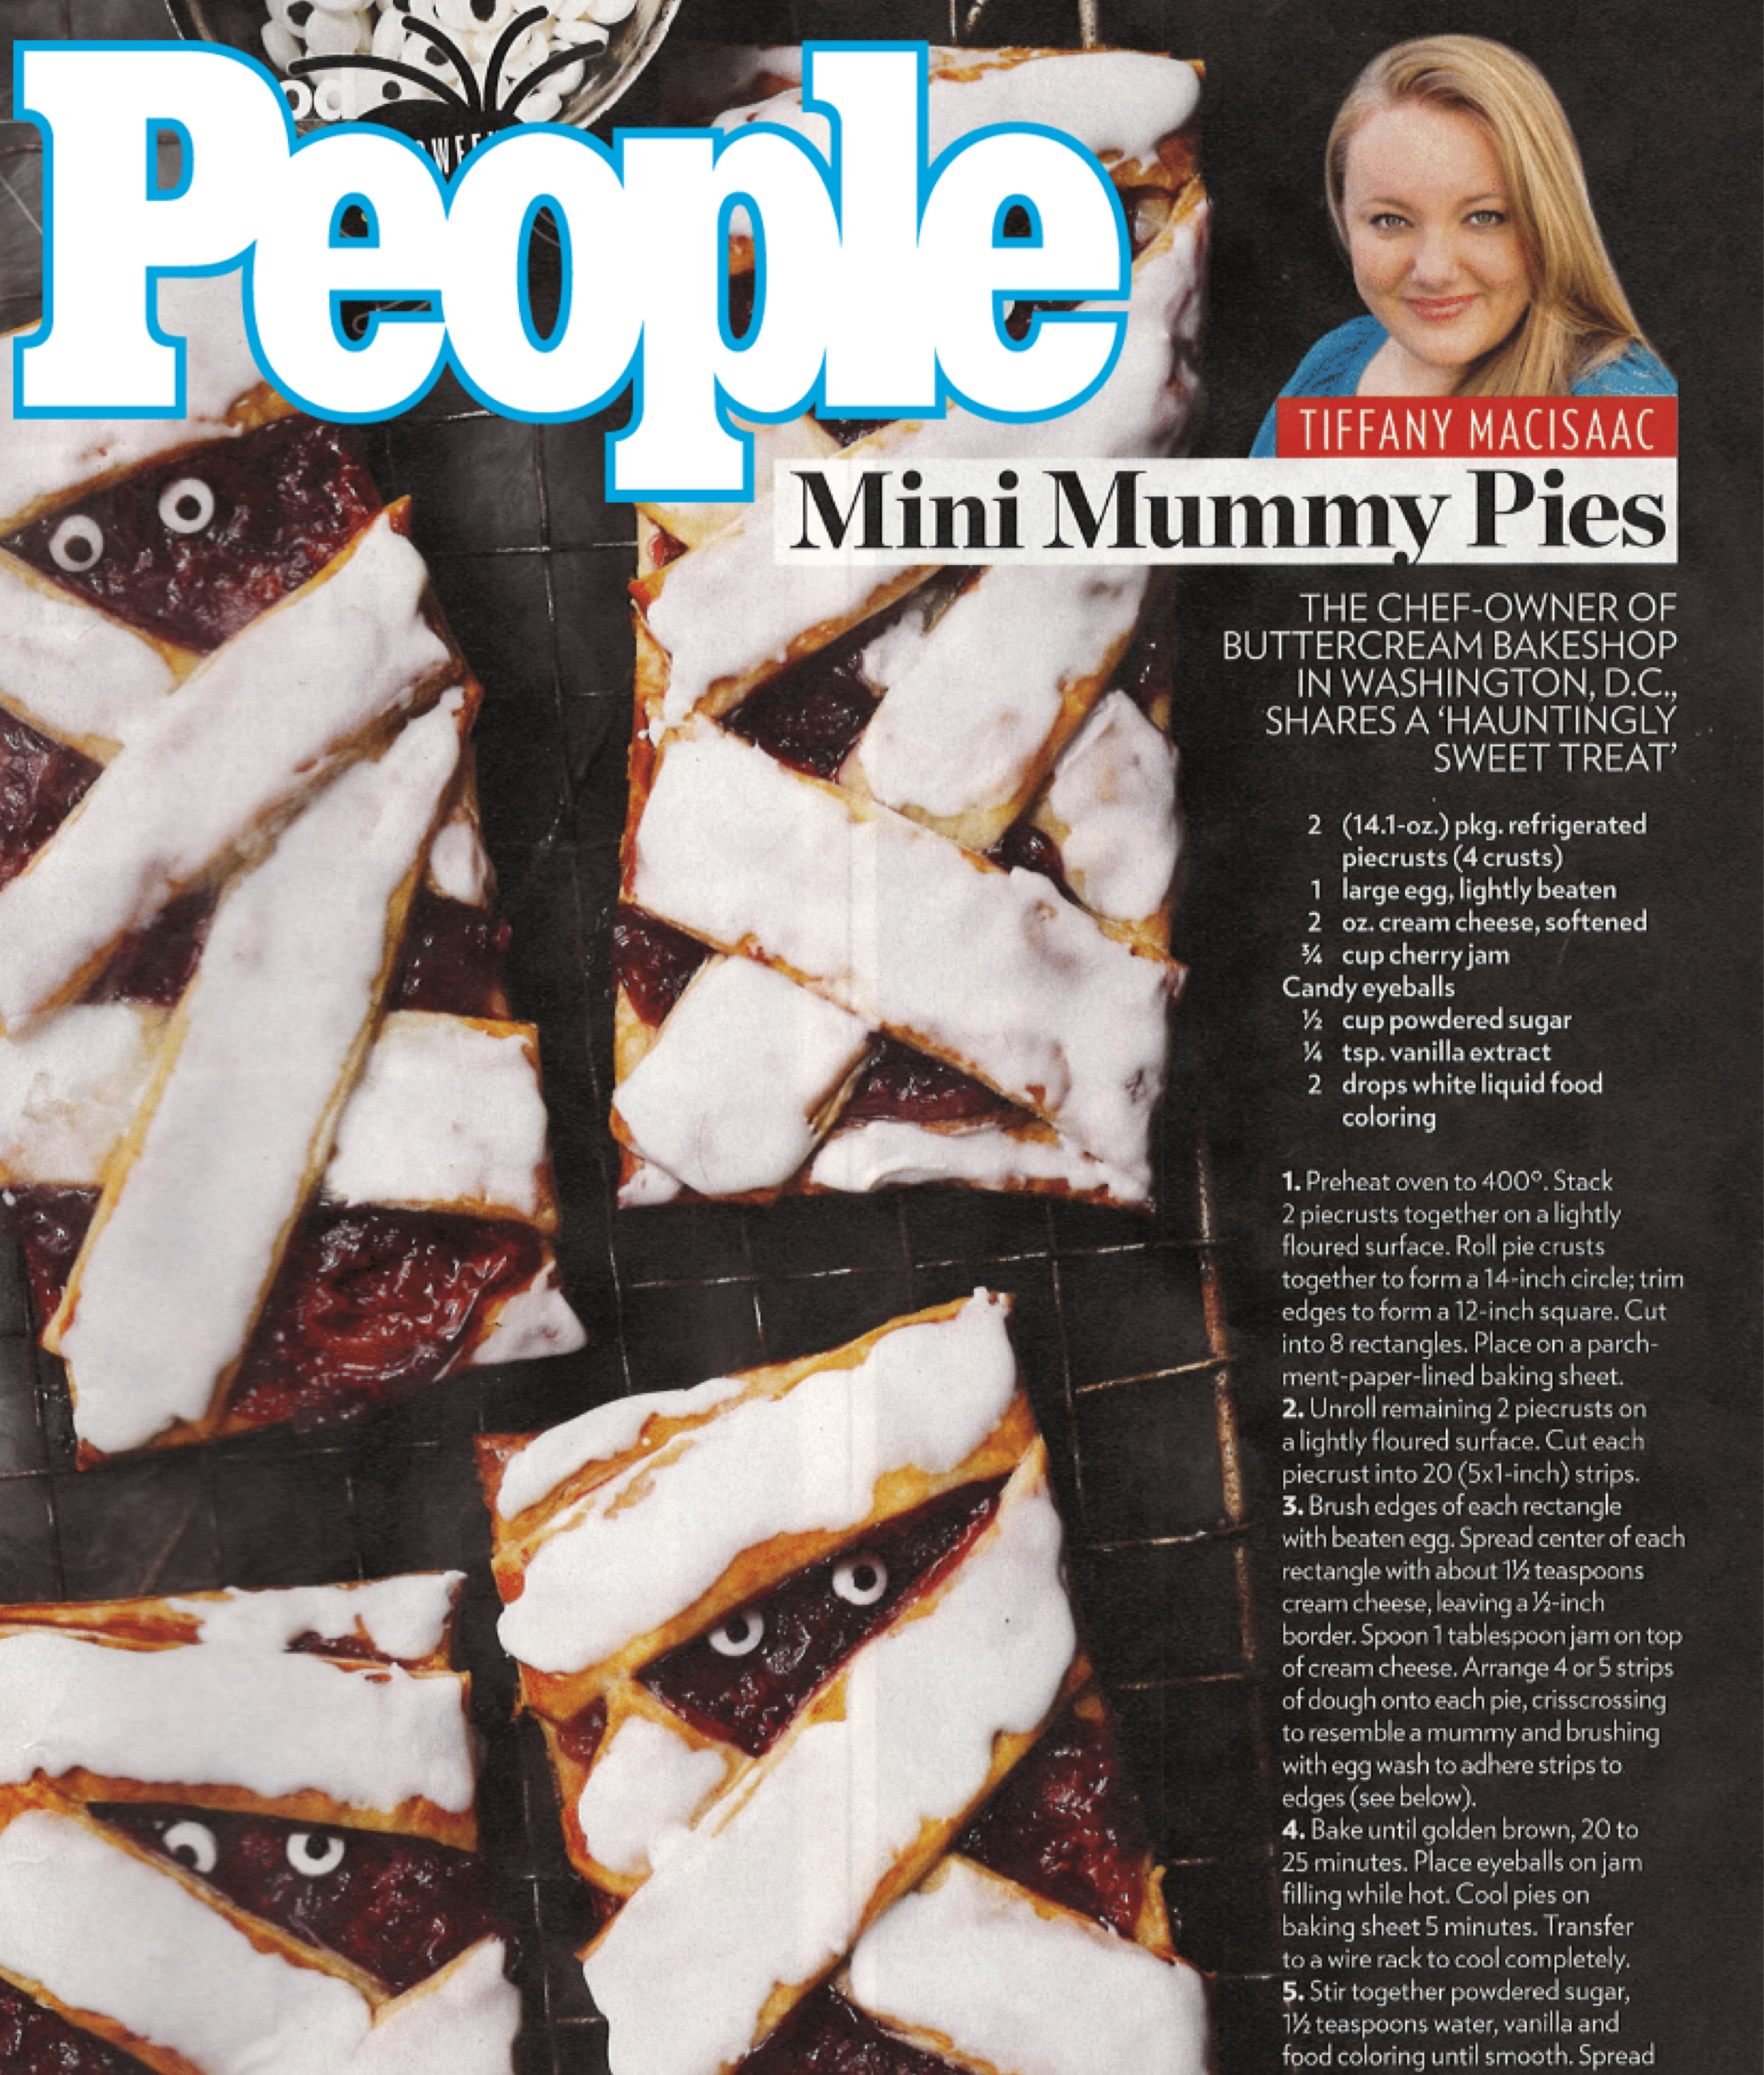 PEOPLE MAGAZINE:Tiffany Macisaac's Mini Mummy Pies - October 18, 2017